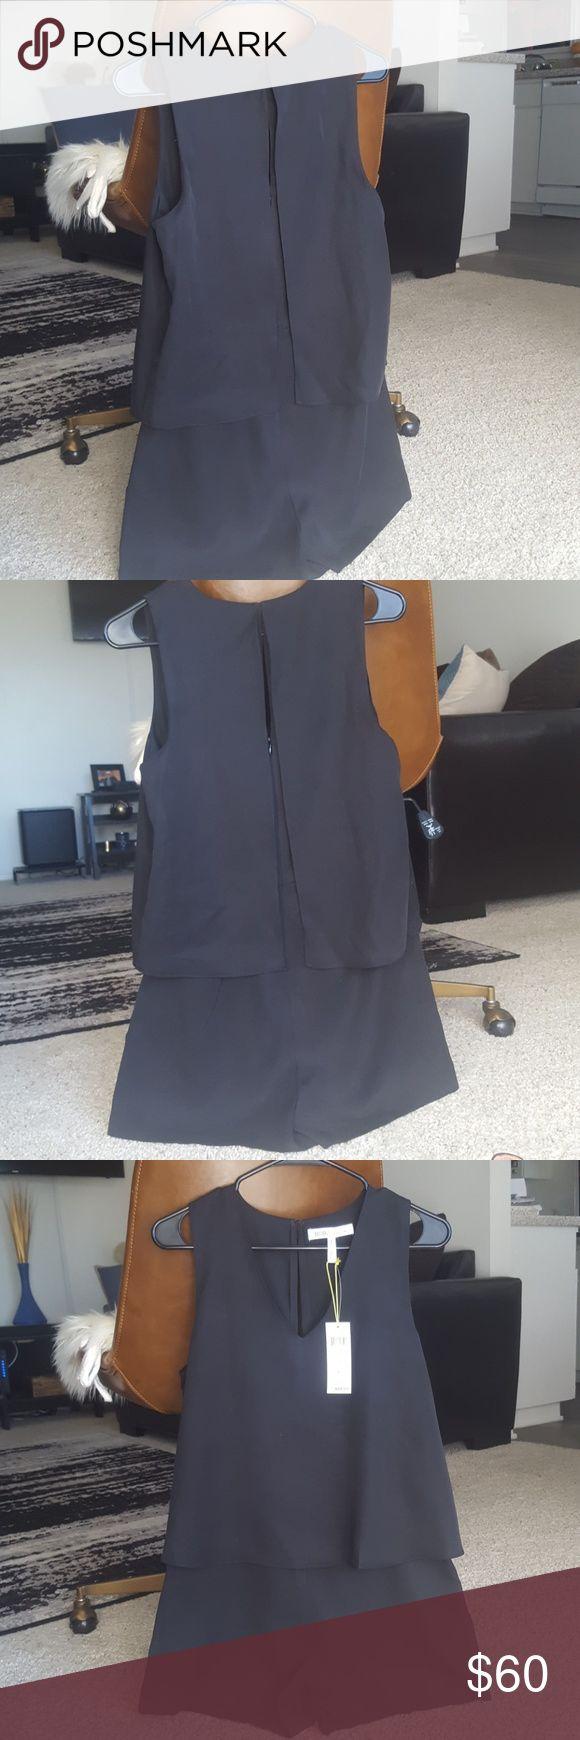 Romper Very cute black romper with zipper on back. BCBGeneration Shorts Skorts